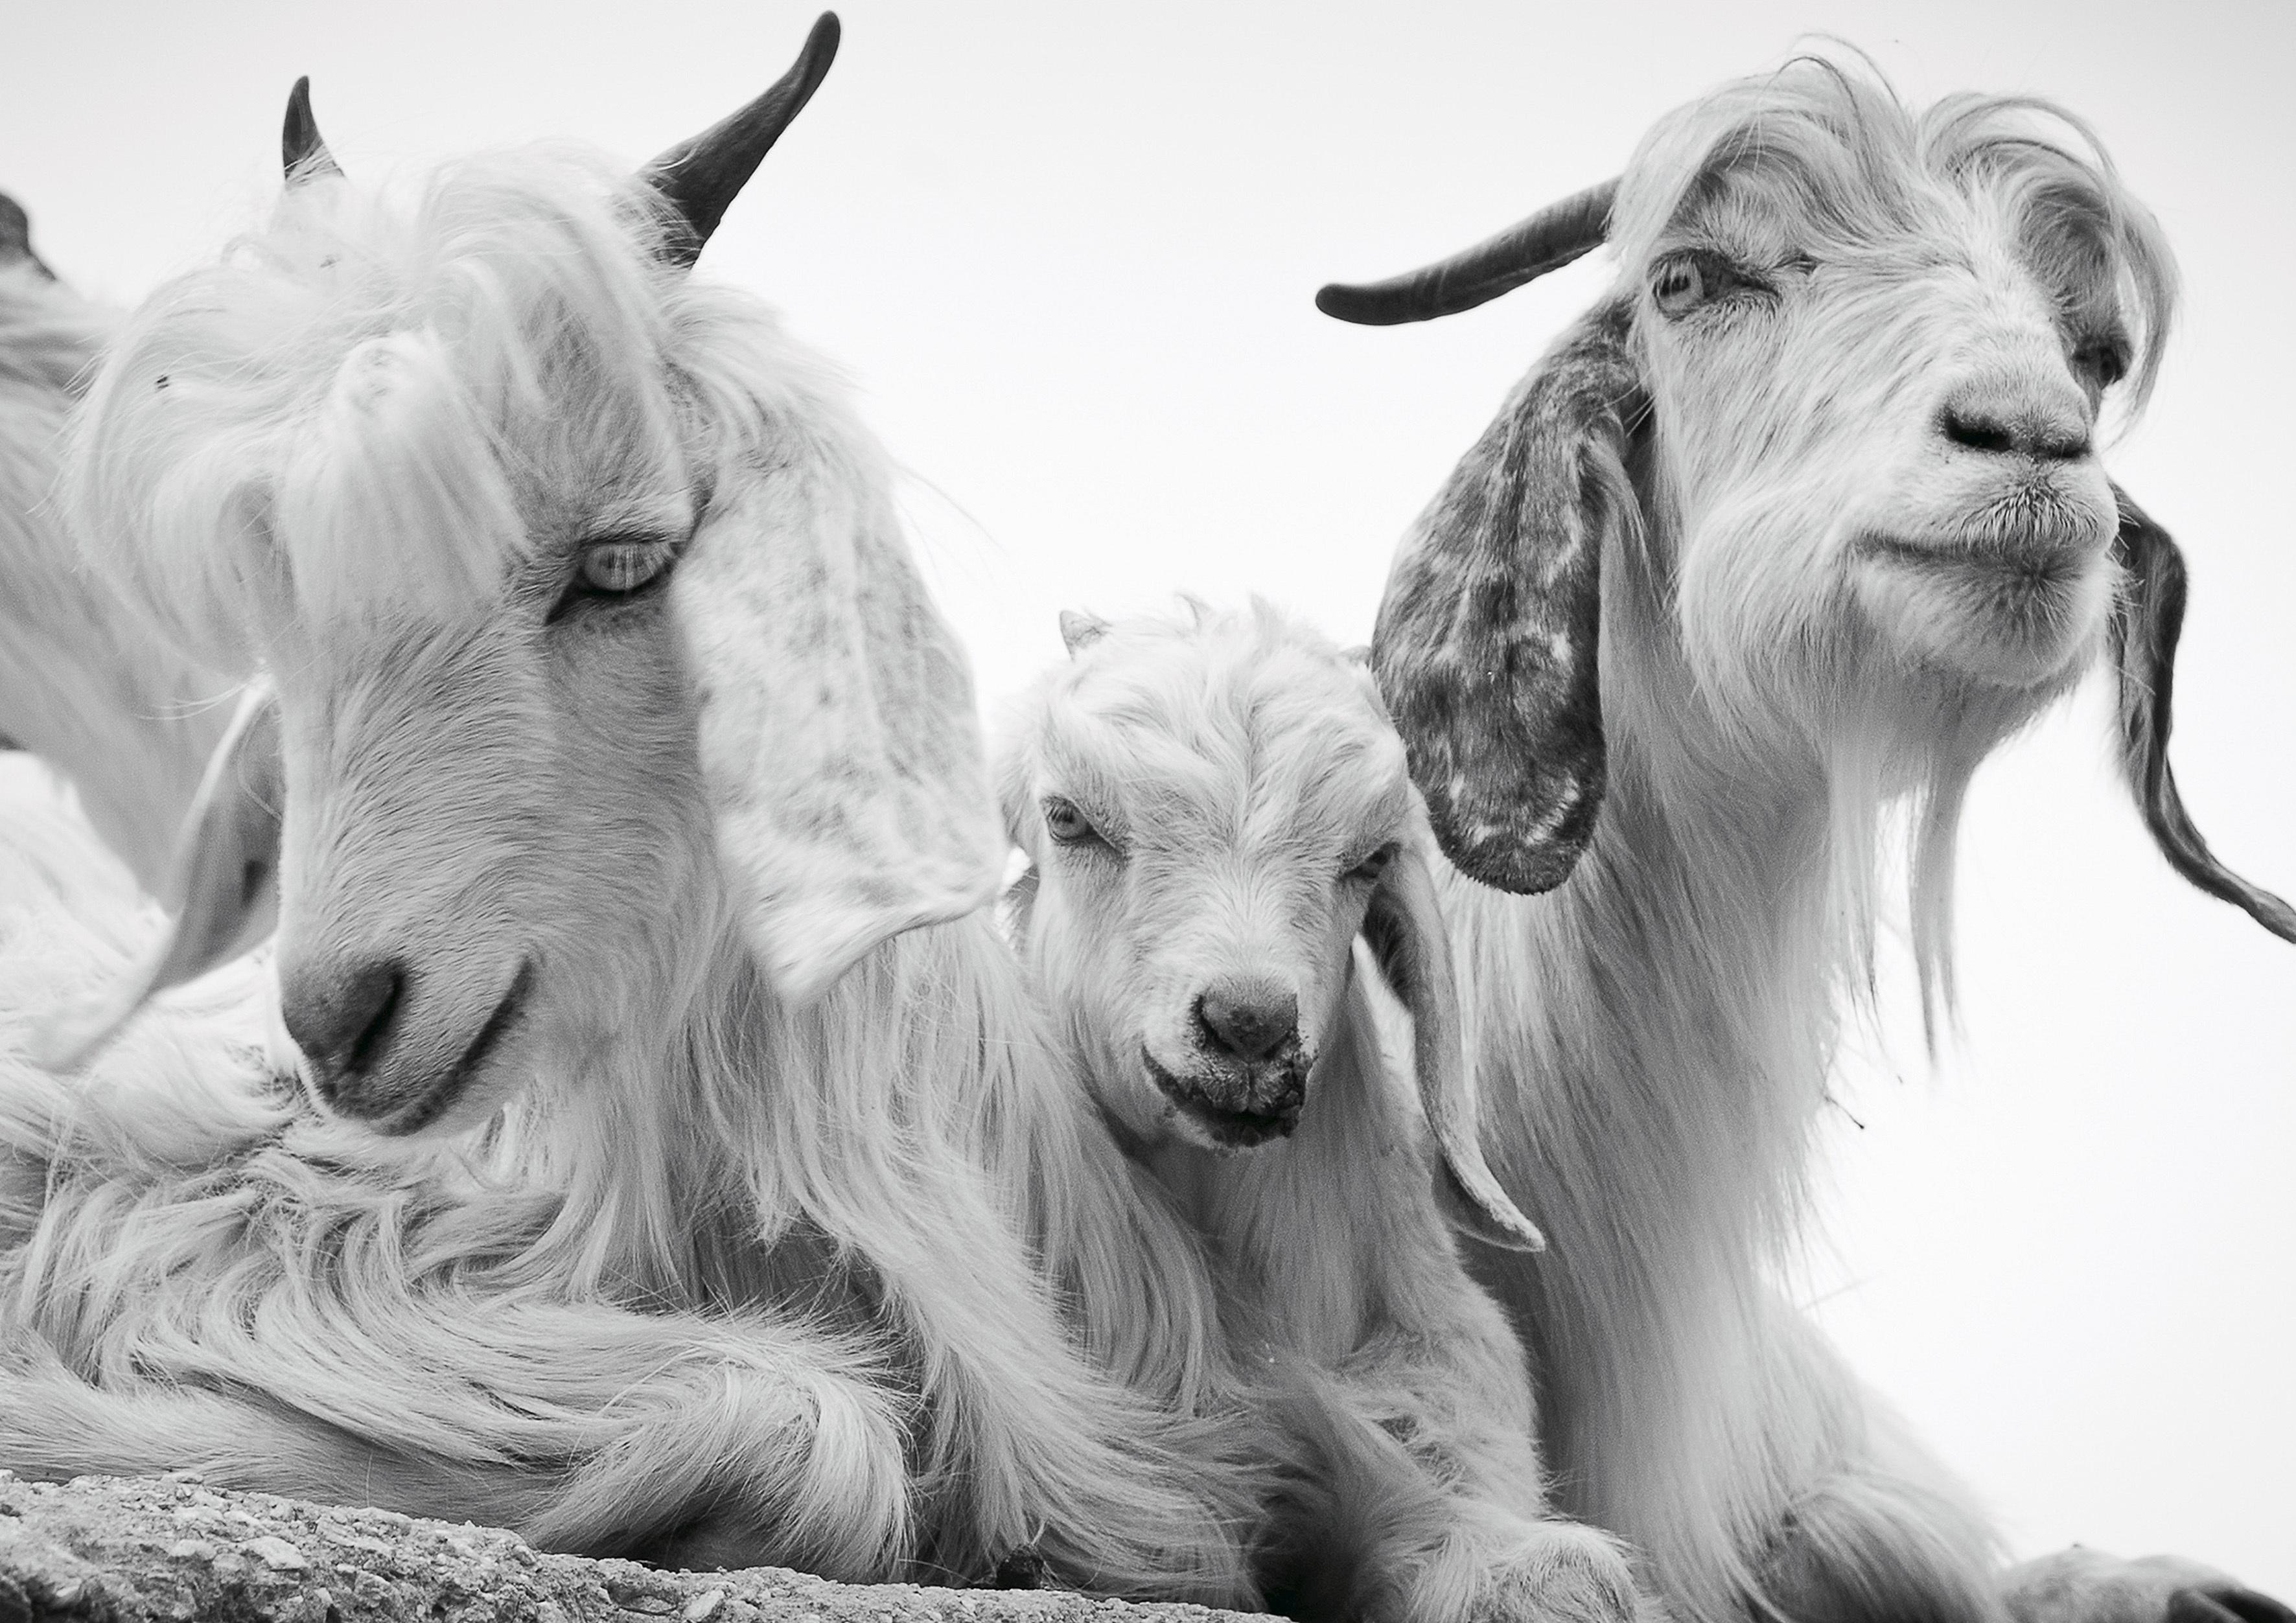 Cute Pashmina goats in Bhagsunag, Dharam